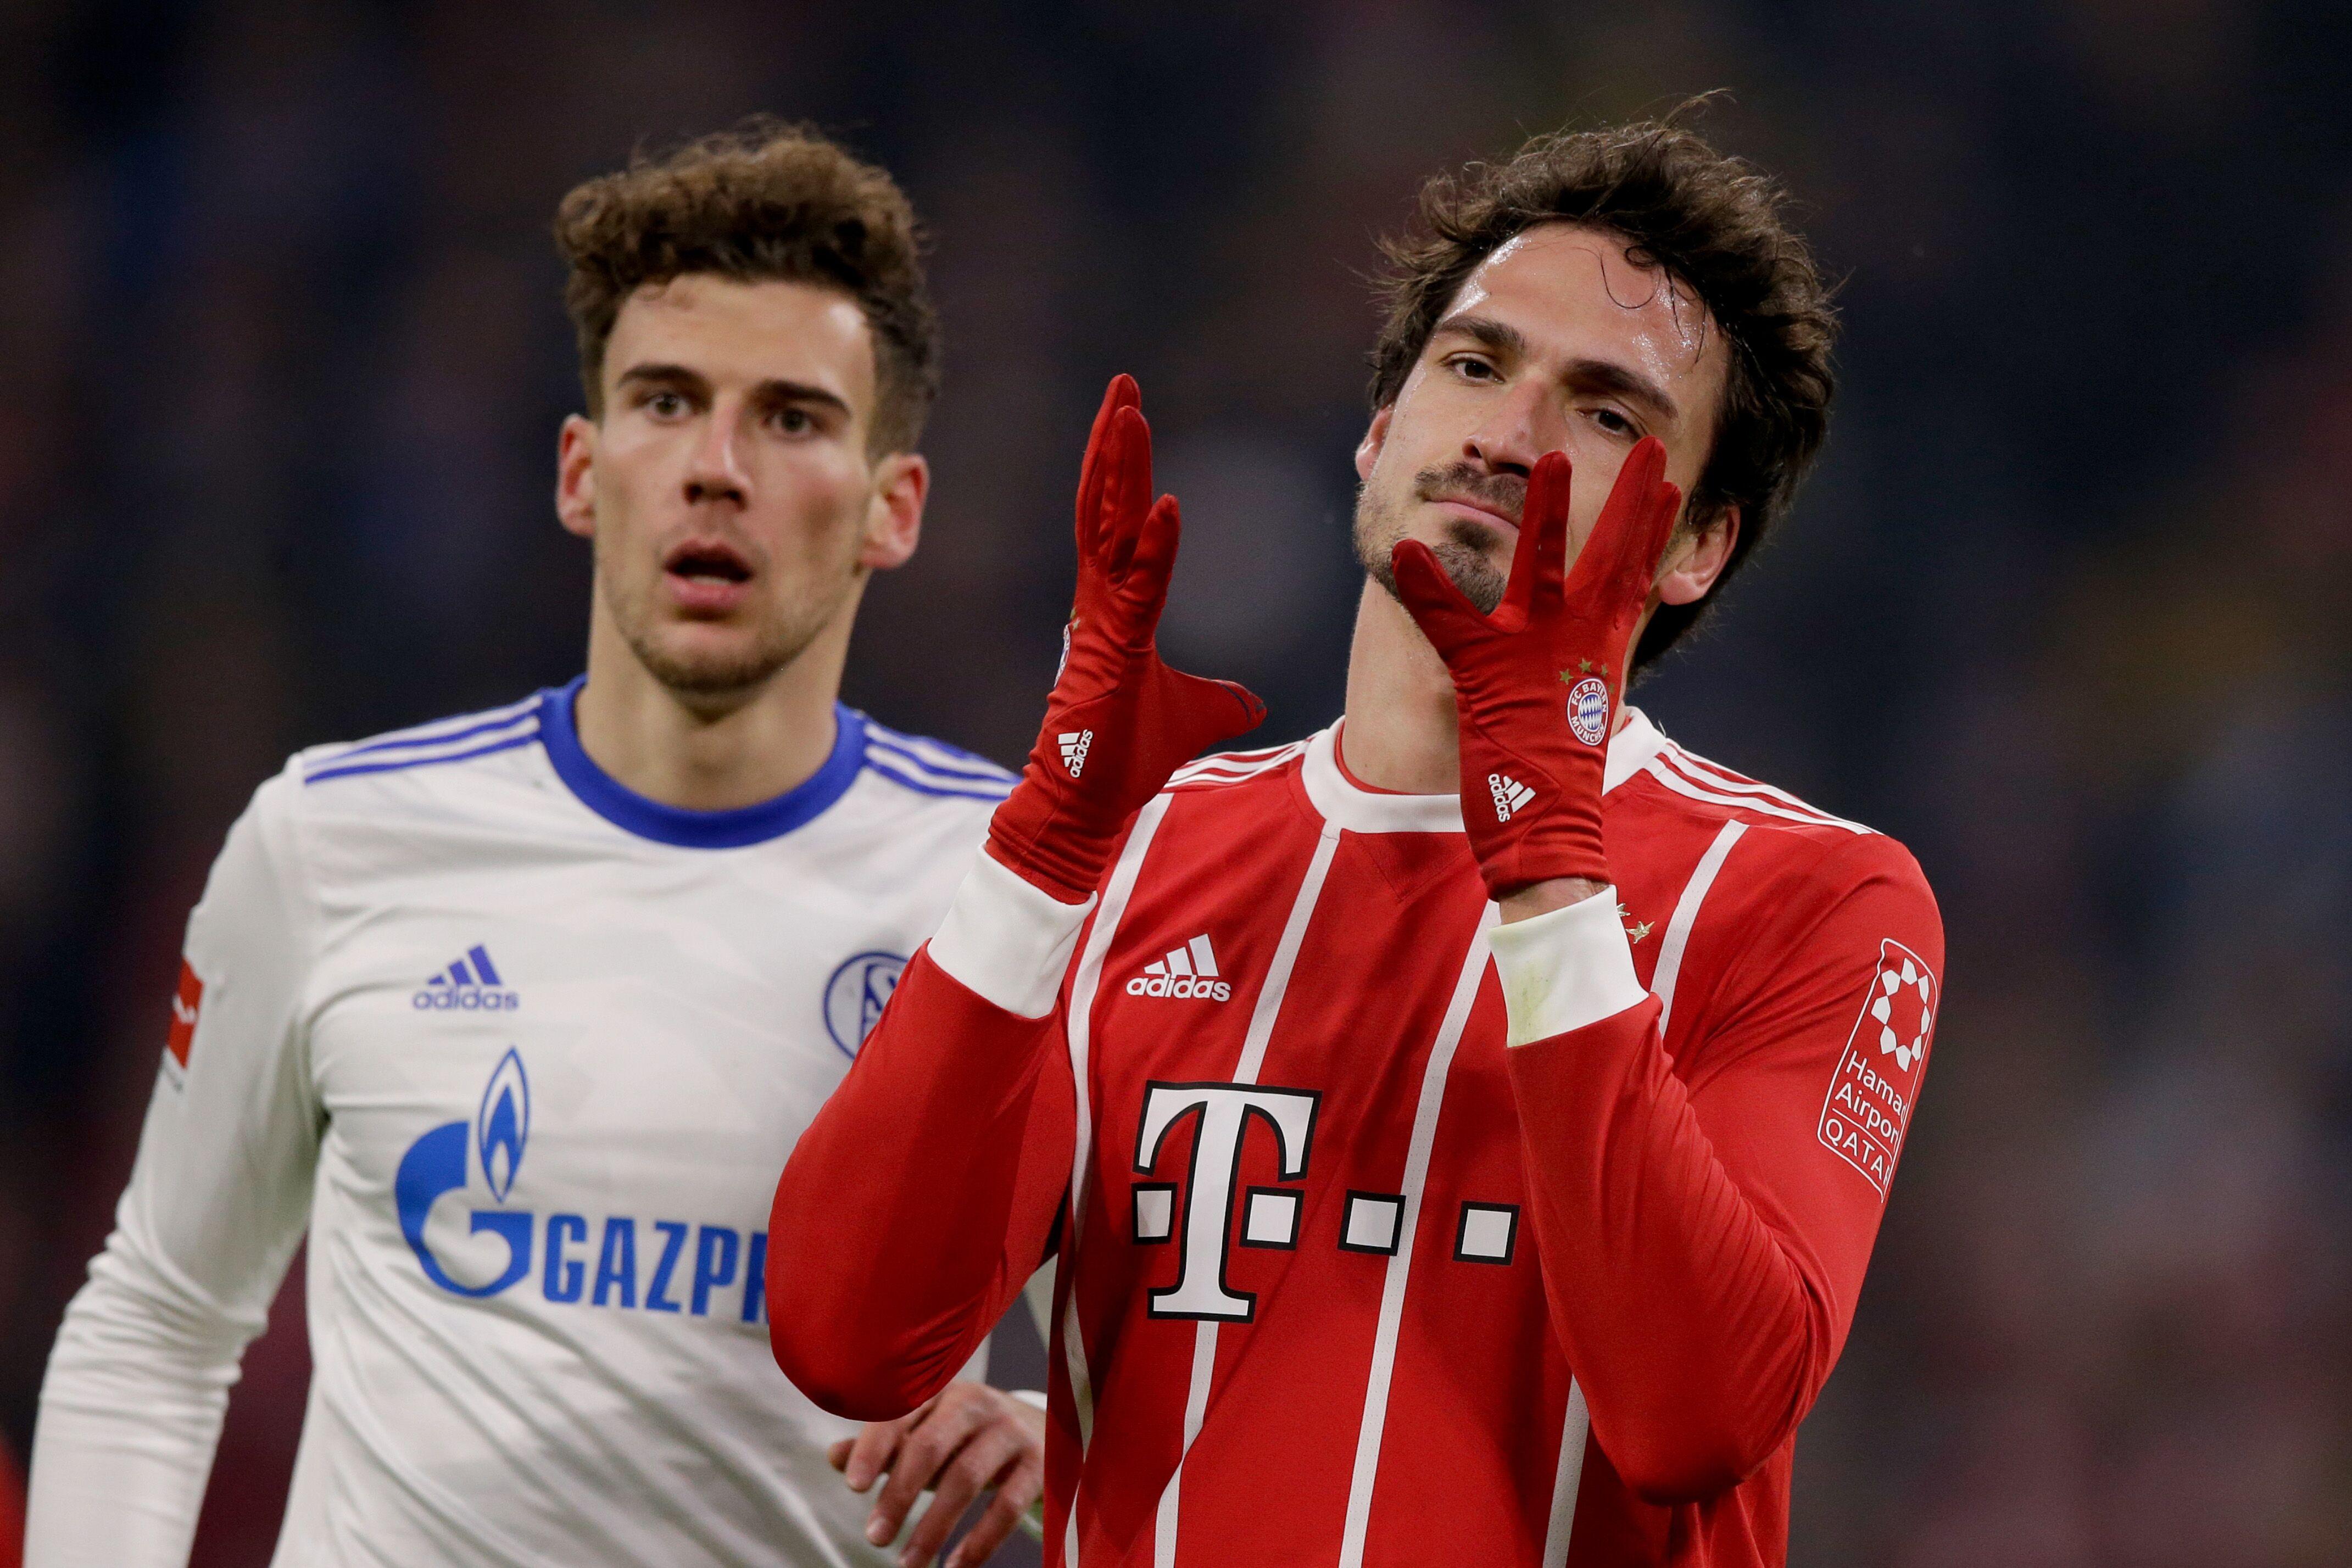 Bayern Munich See Out Sloppy 2 1 Victory Over Schalke Player Grades